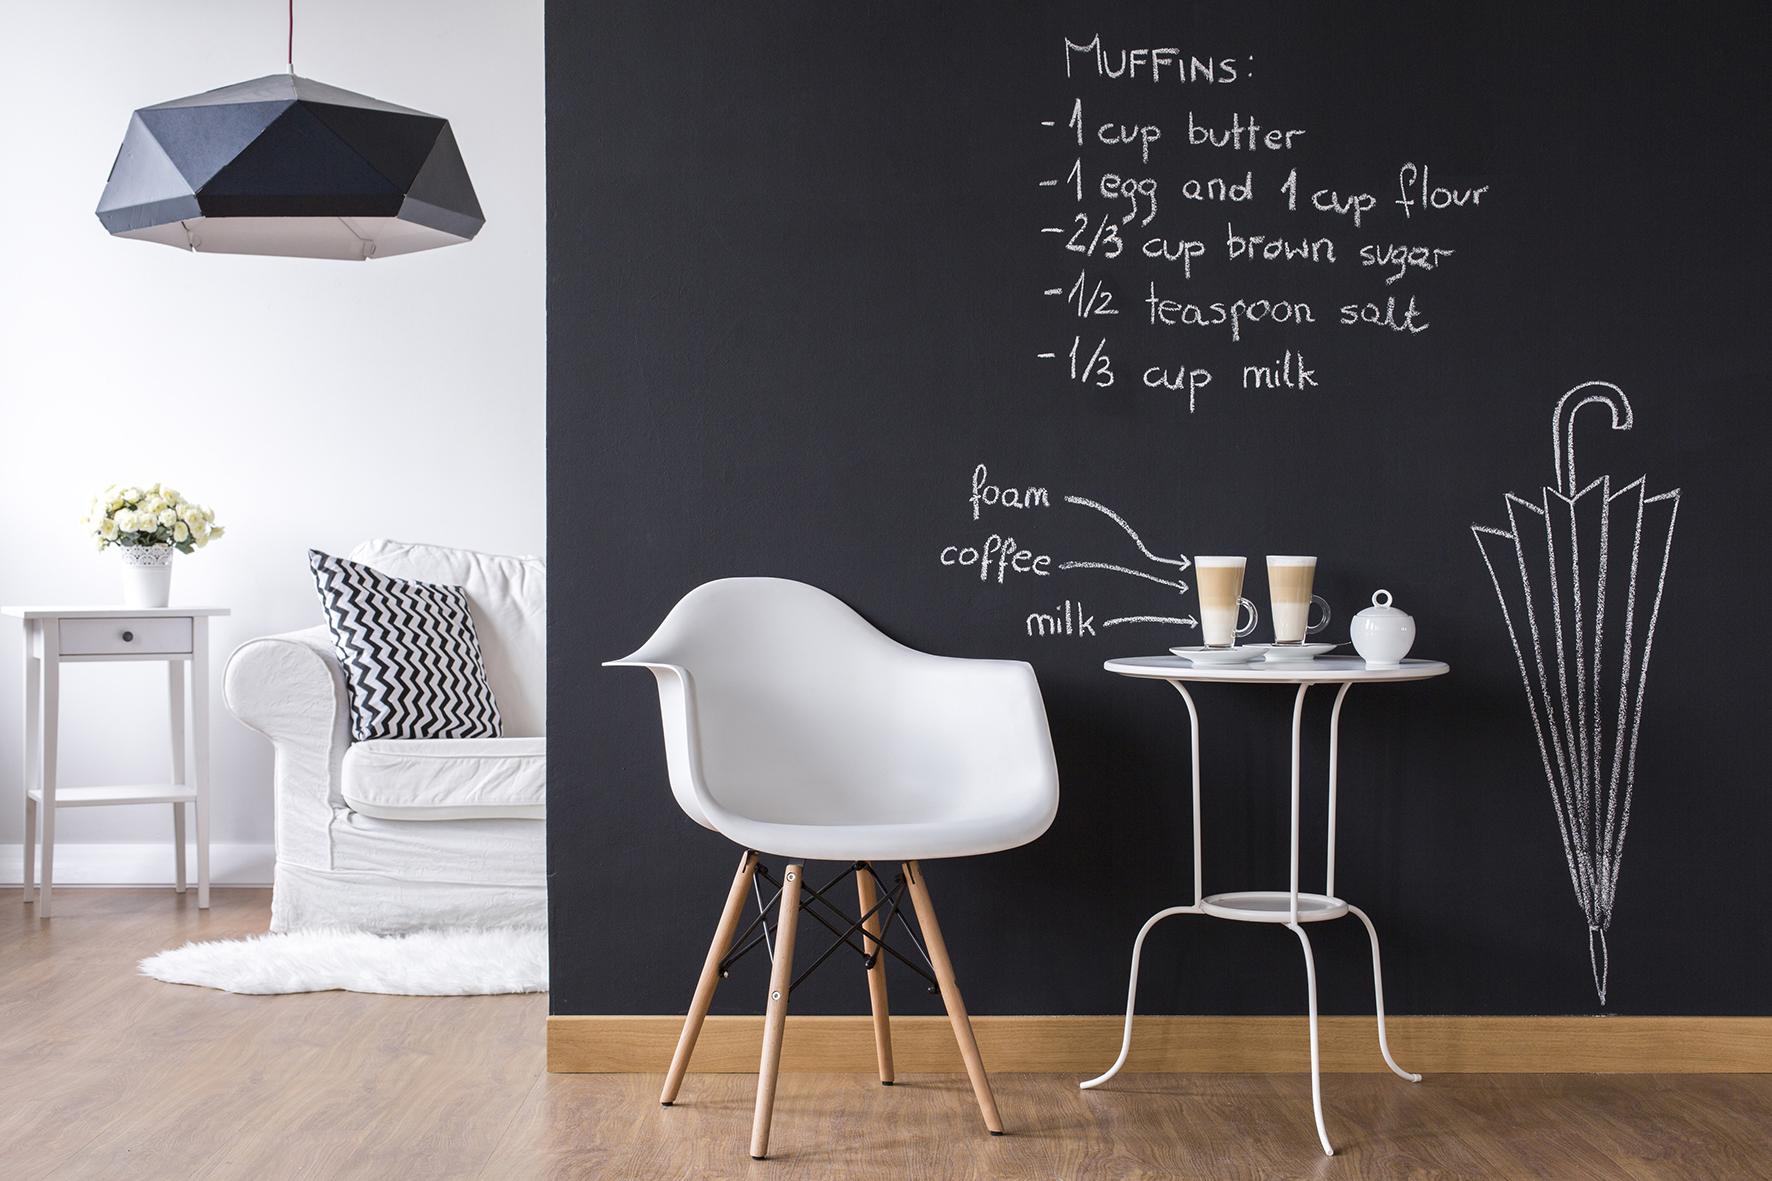 verf van niveau niveau vbs. Black Bedroom Furniture Sets. Home Design Ideas